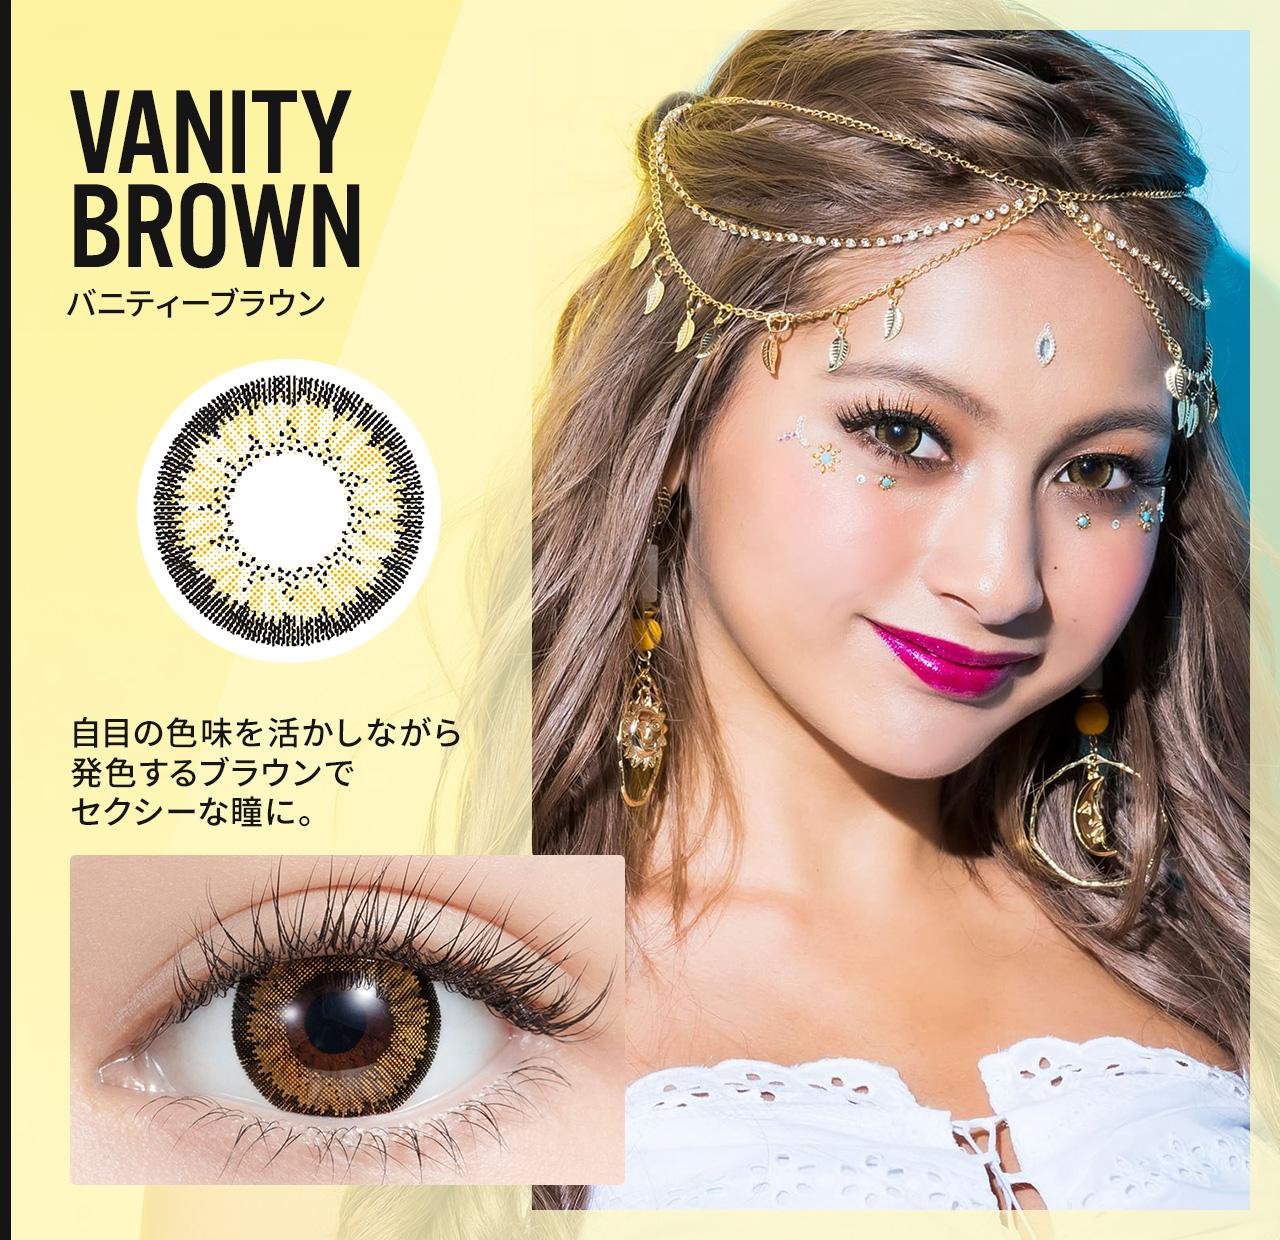 VANITY BROWN バニティーブラウン